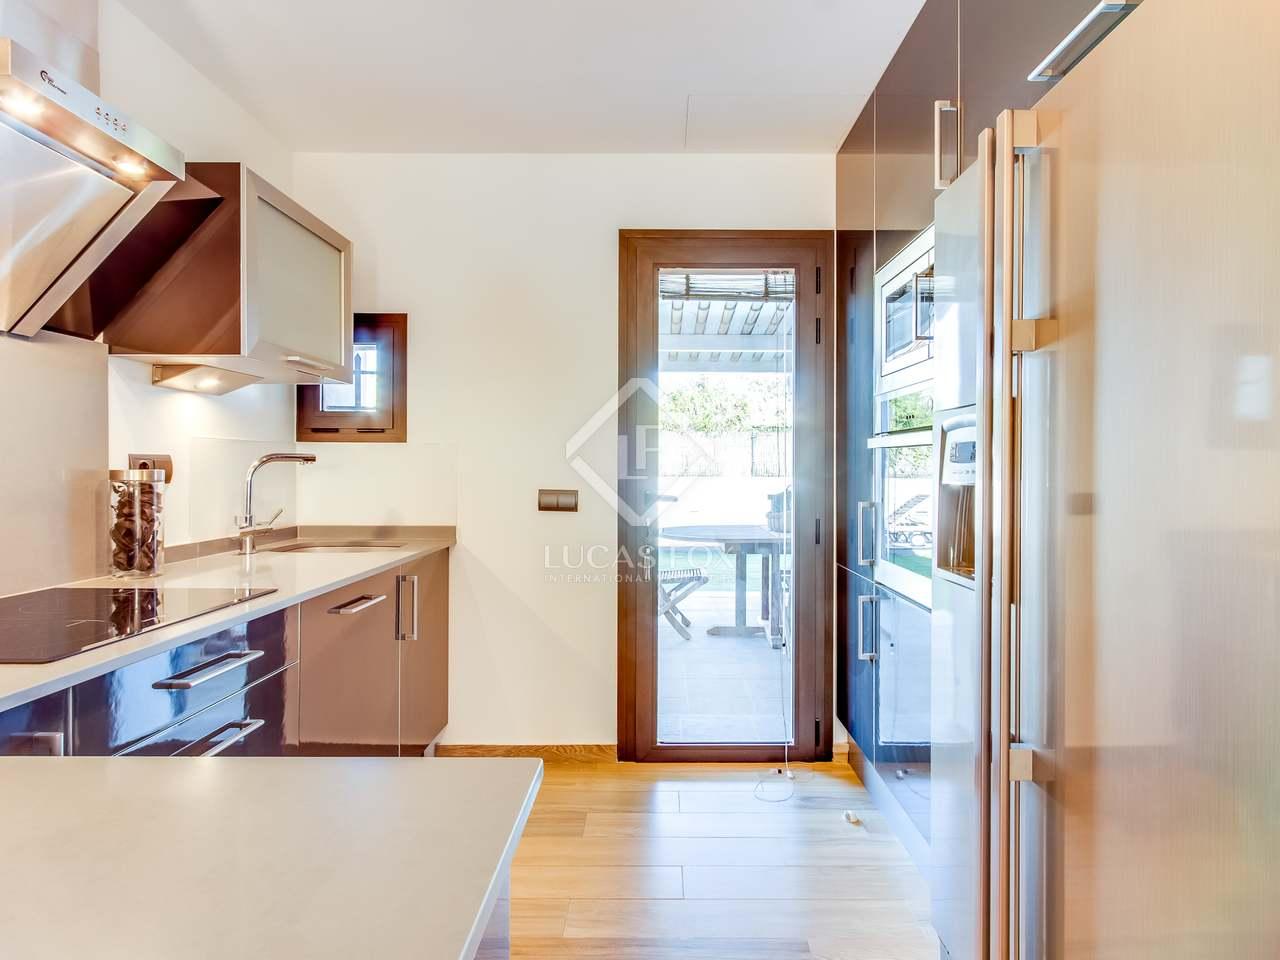 83m haus villa zum verkauf in santa eulalia ibiza. Black Bedroom Furniture Sets. Home Design Ideas